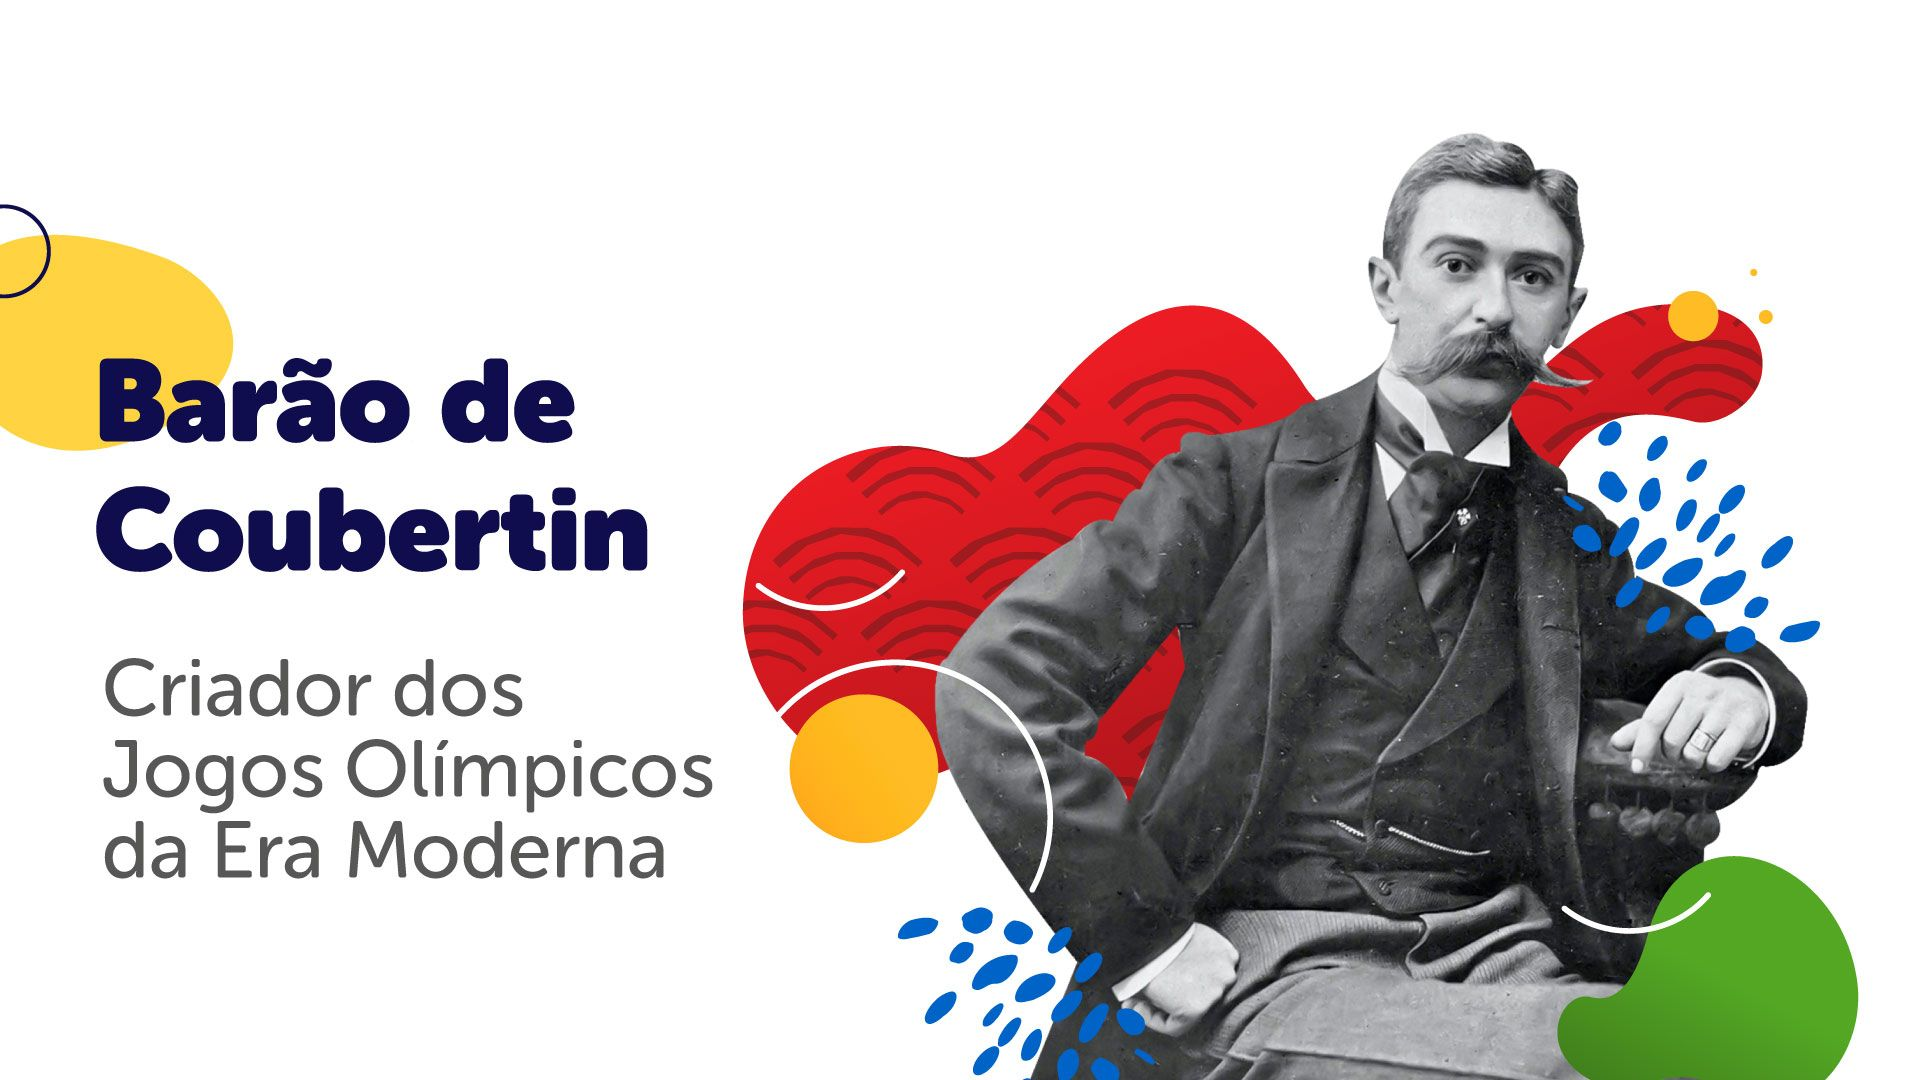 Criador das Olimpíadas da Era Moderna foi Pierre de Coubertin (Arte/Zoom)